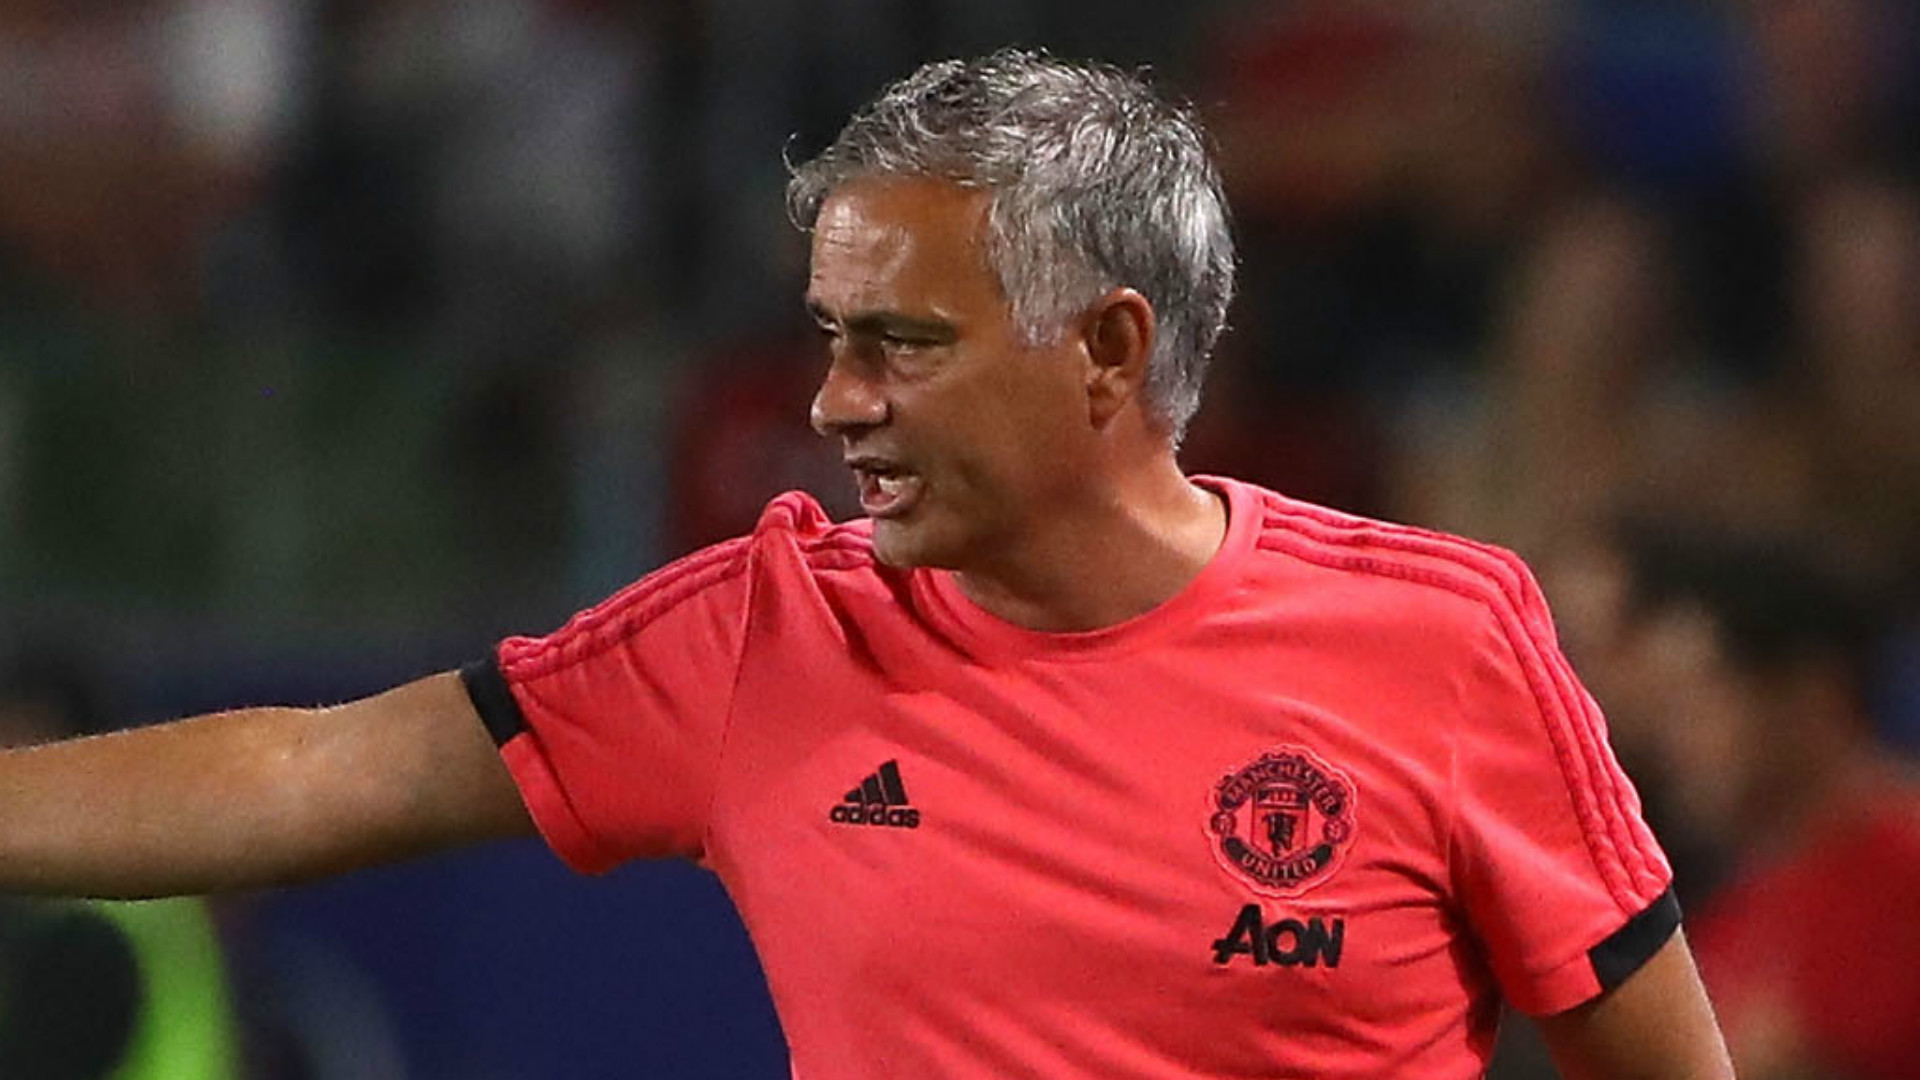 Rencana Transfer Manchester United Musim Panas Ini Perlu